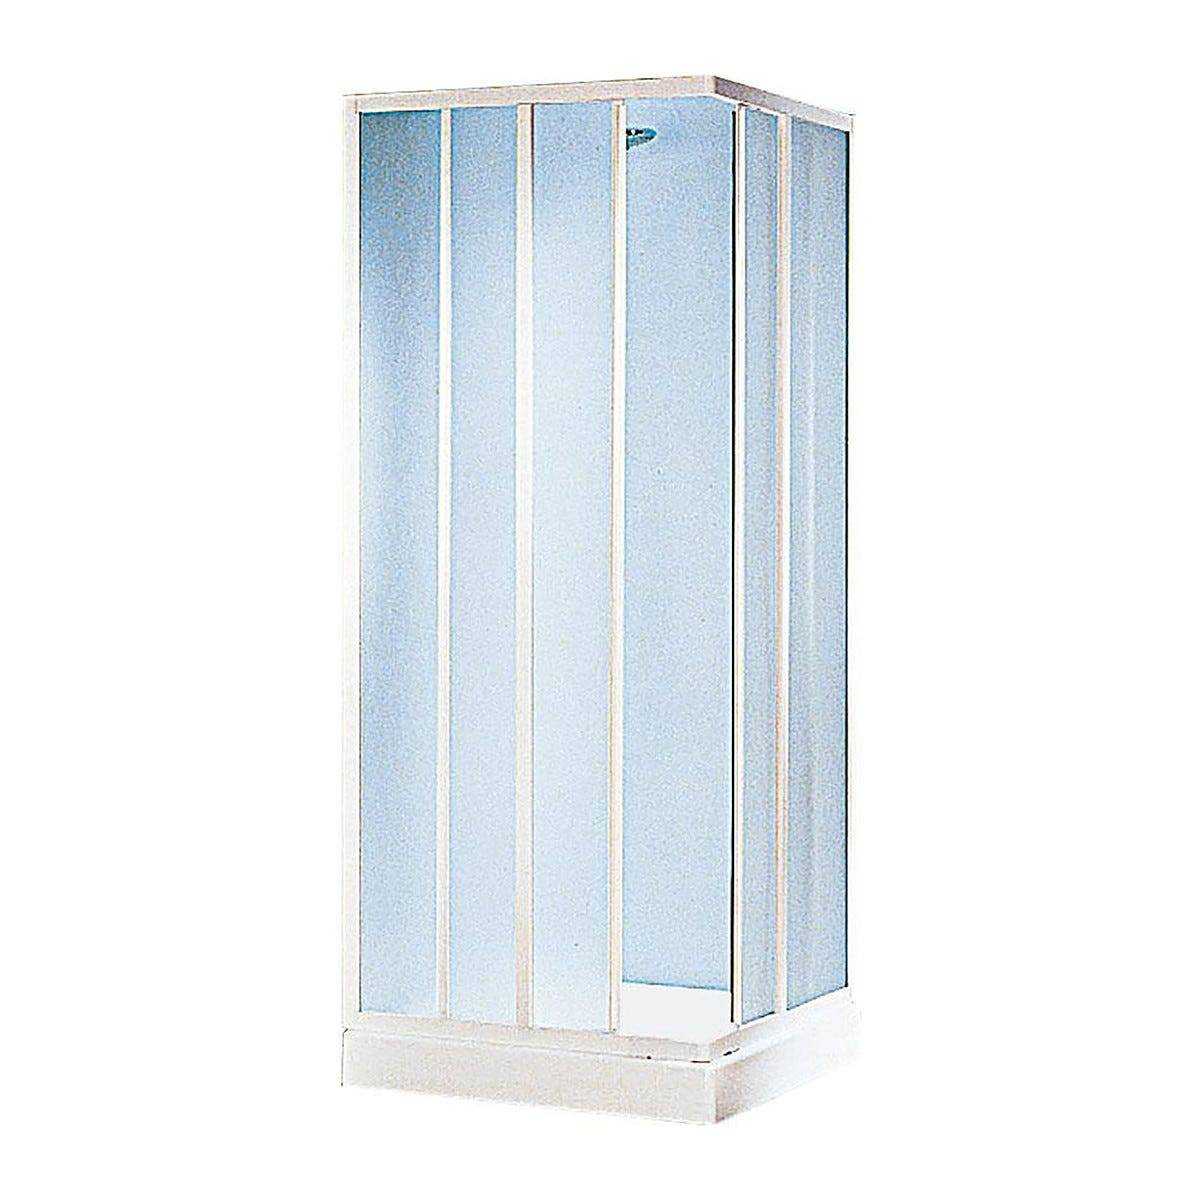 box doccia grancaym rett (65-75)x(80-90) h185cm vetro temperato 3mm stampato  profili bianchi